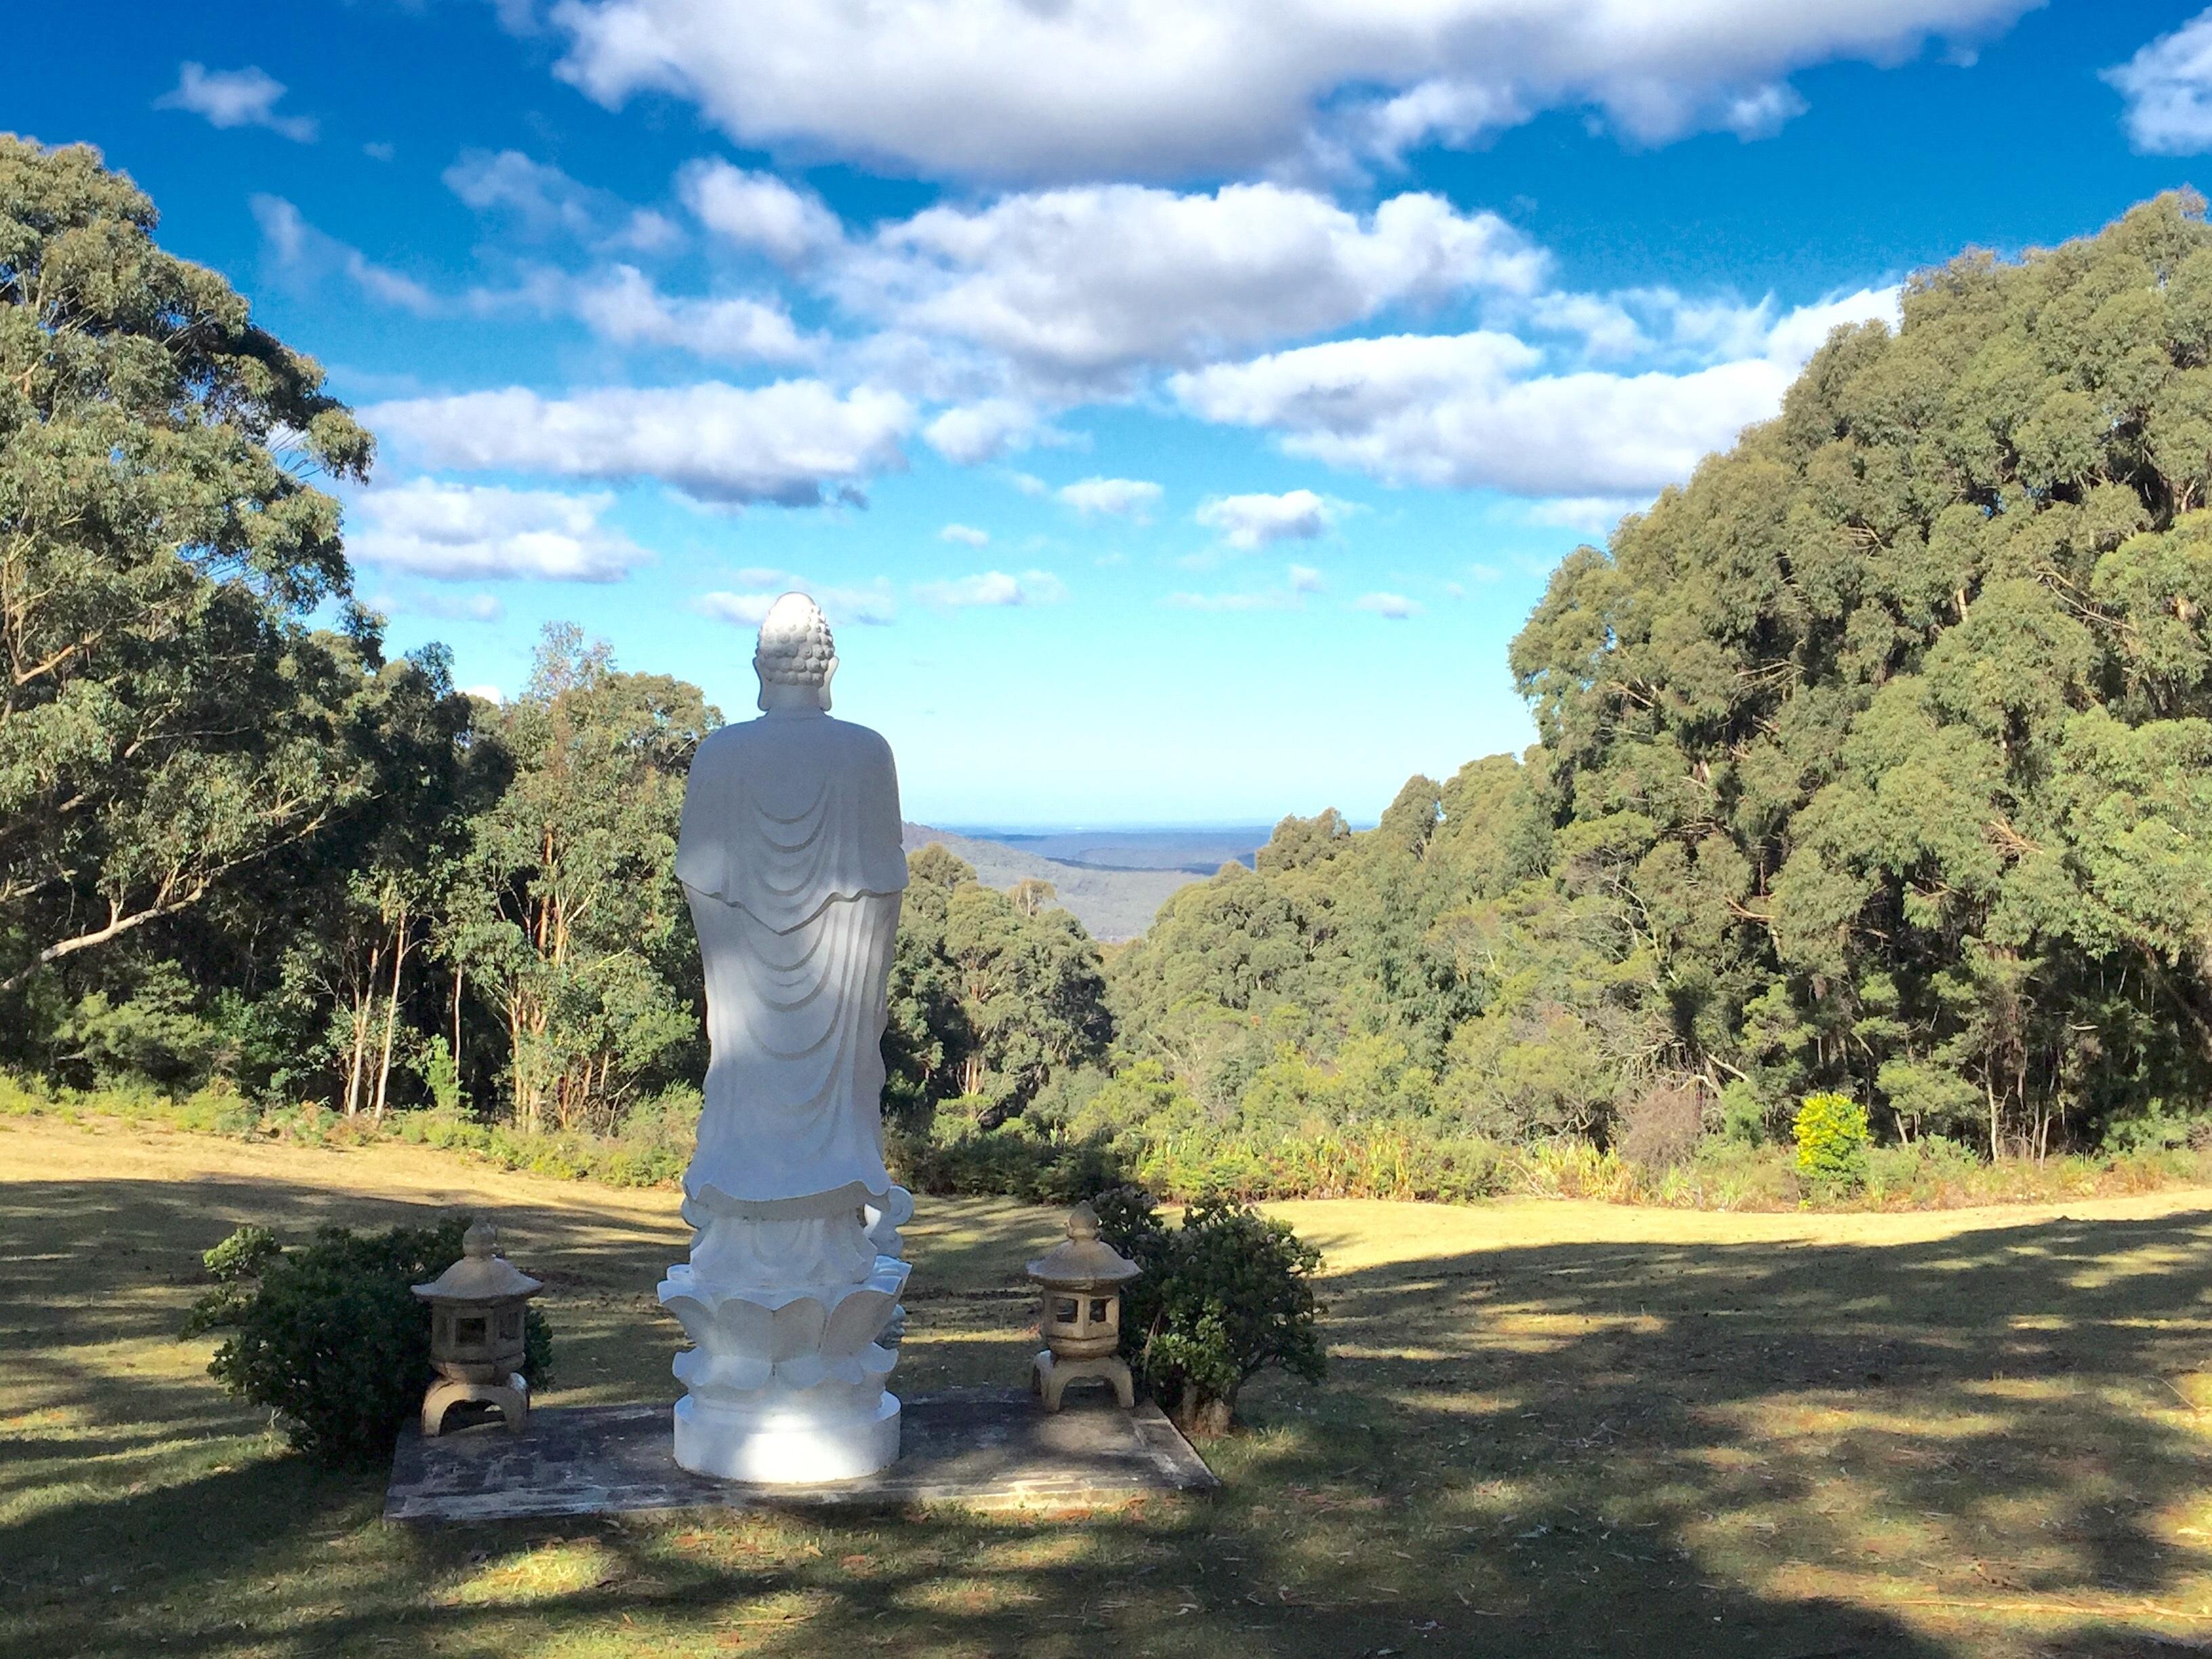 Sunnatarum meditation retreat